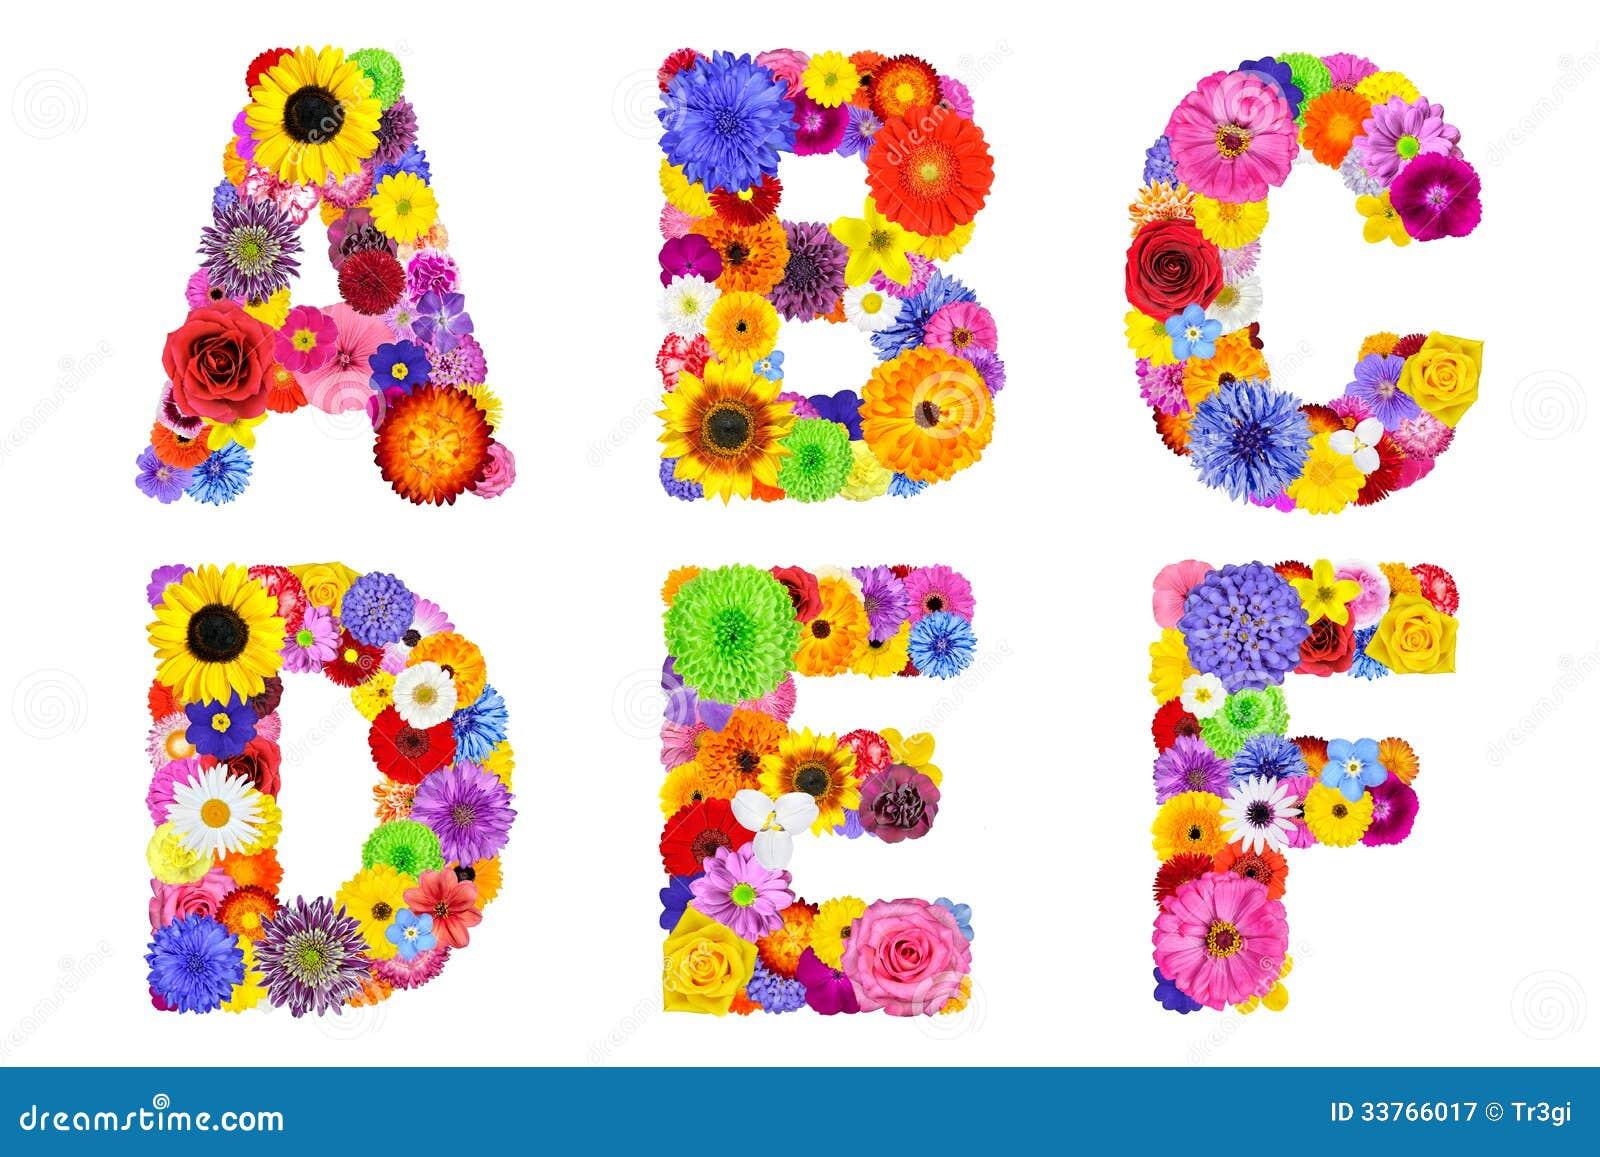 ��.d:-a:+�_六封信件a, b, c, d, e, f由许多五颜六色和原始的花制成.